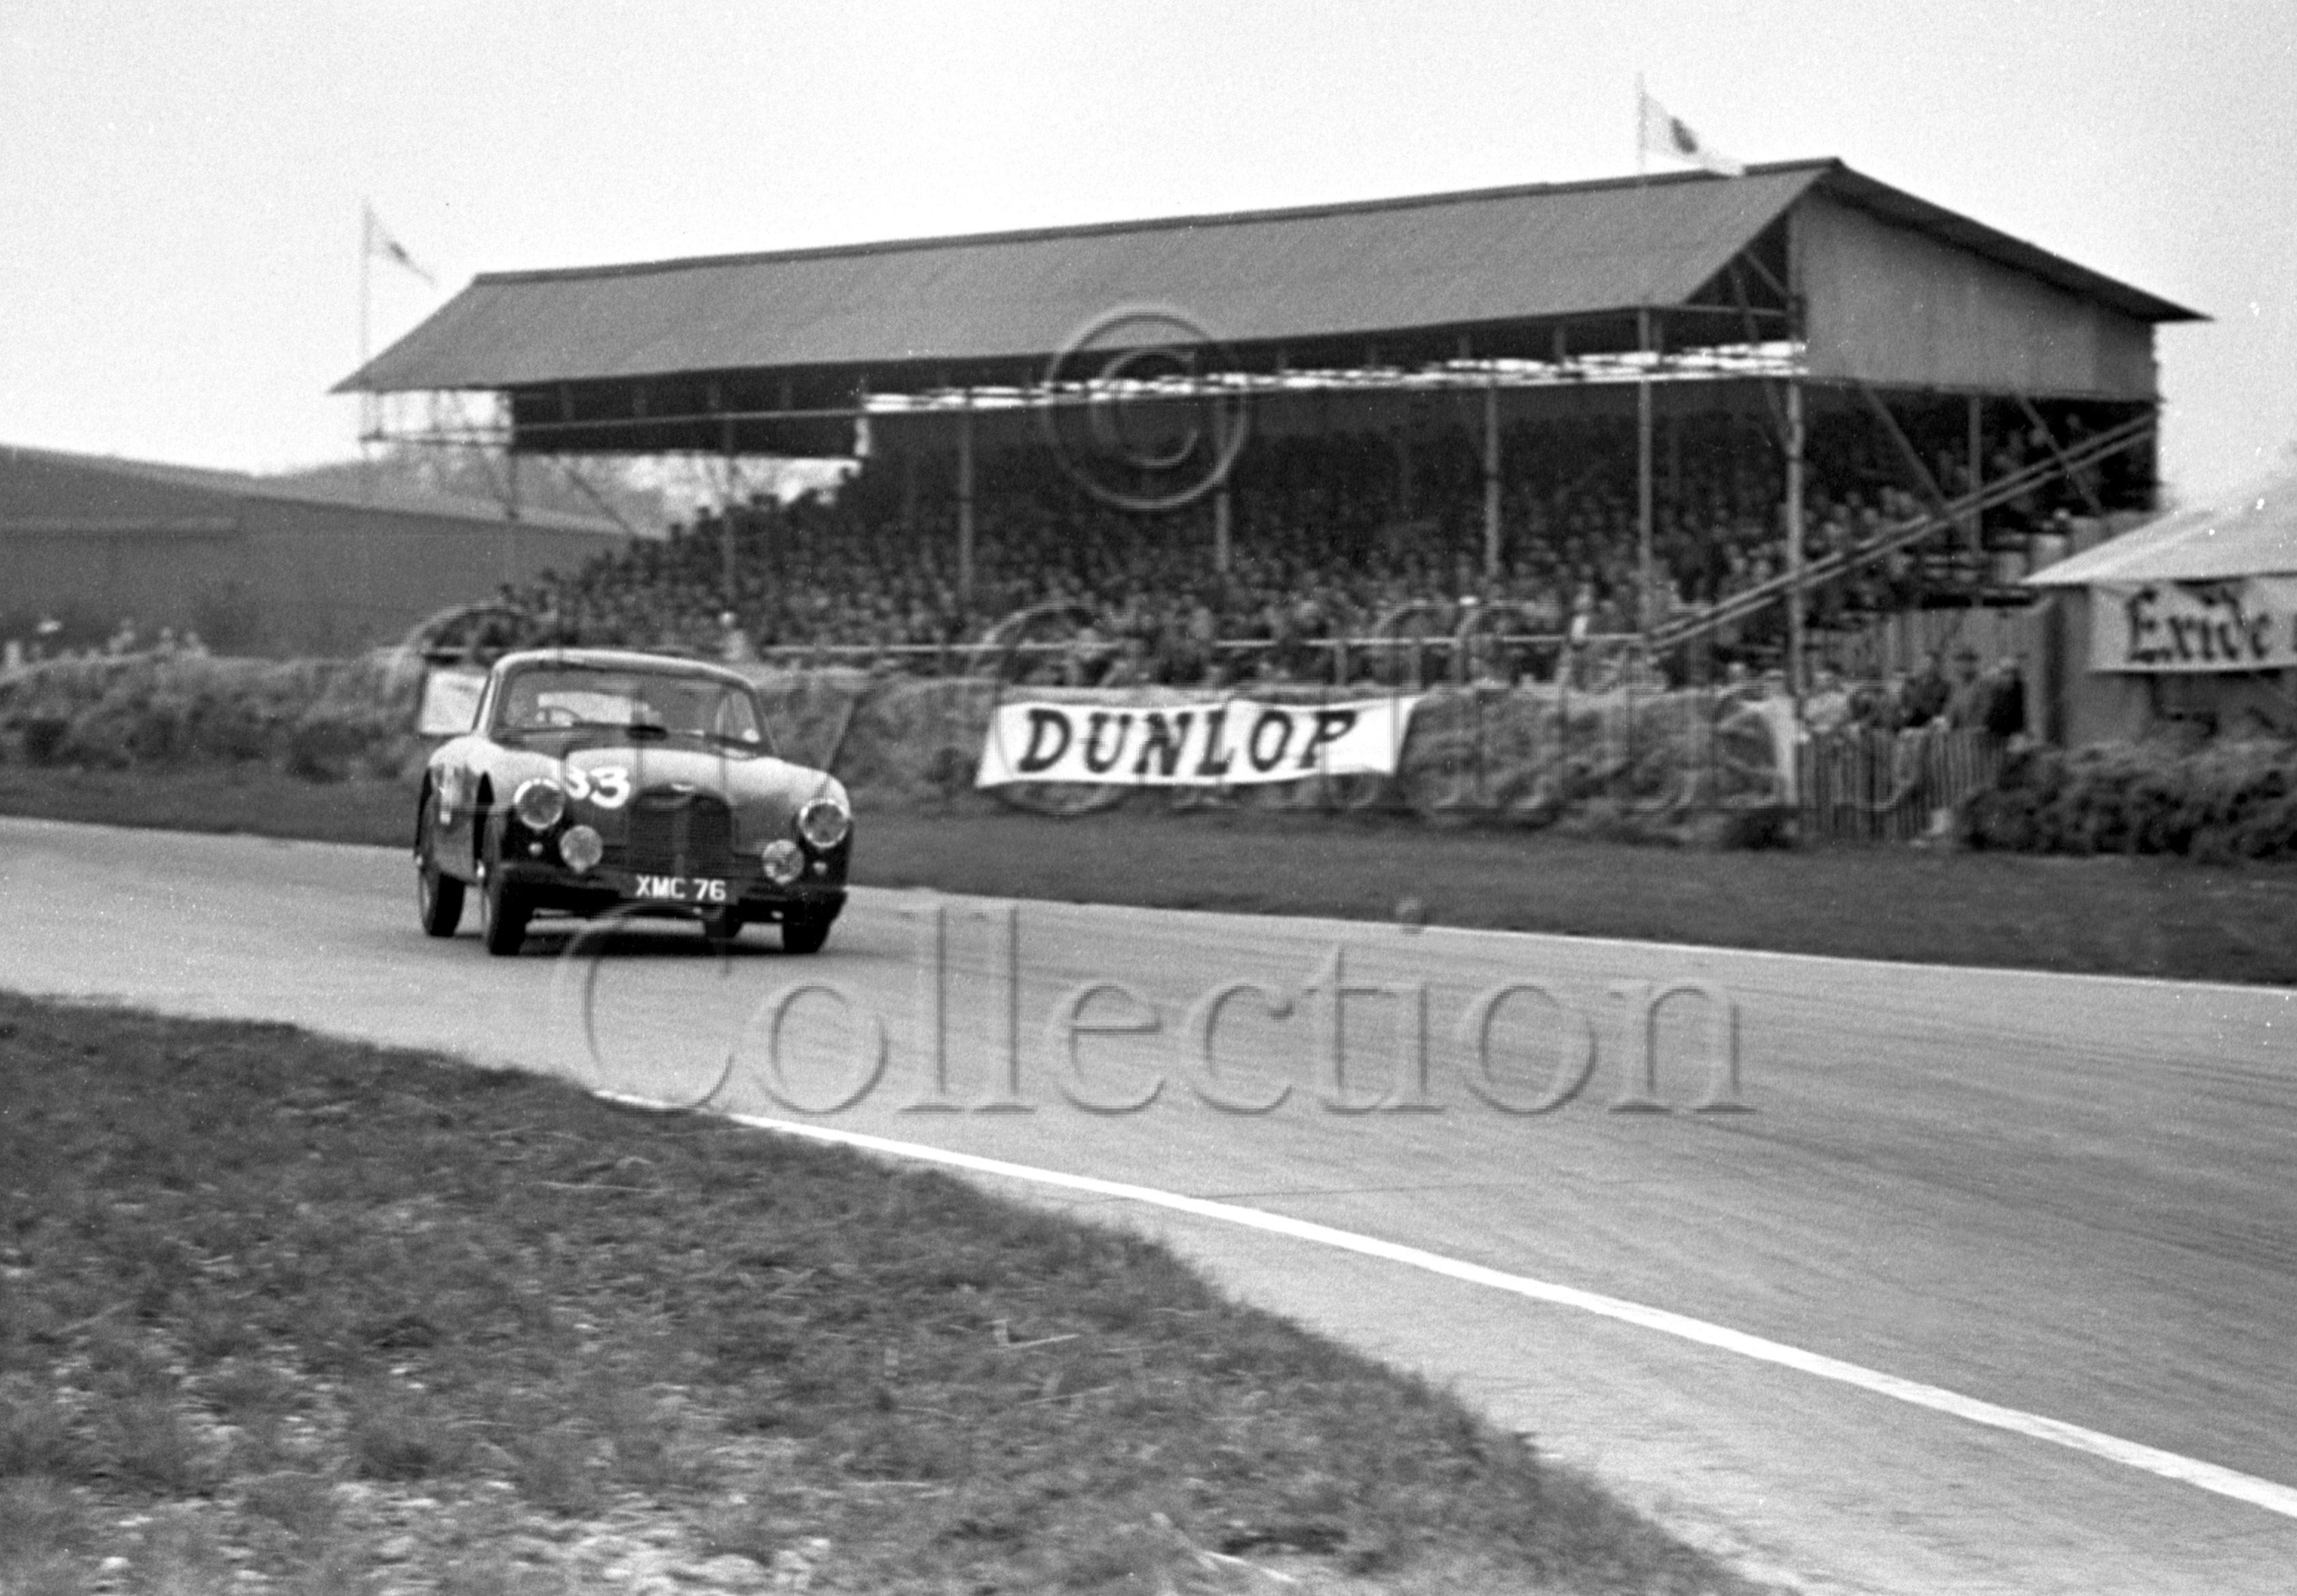 52-731–E-Thompson–Aston-Martin–Goodwood–14-04-1952.jpg - The Guy Griffiths Collection